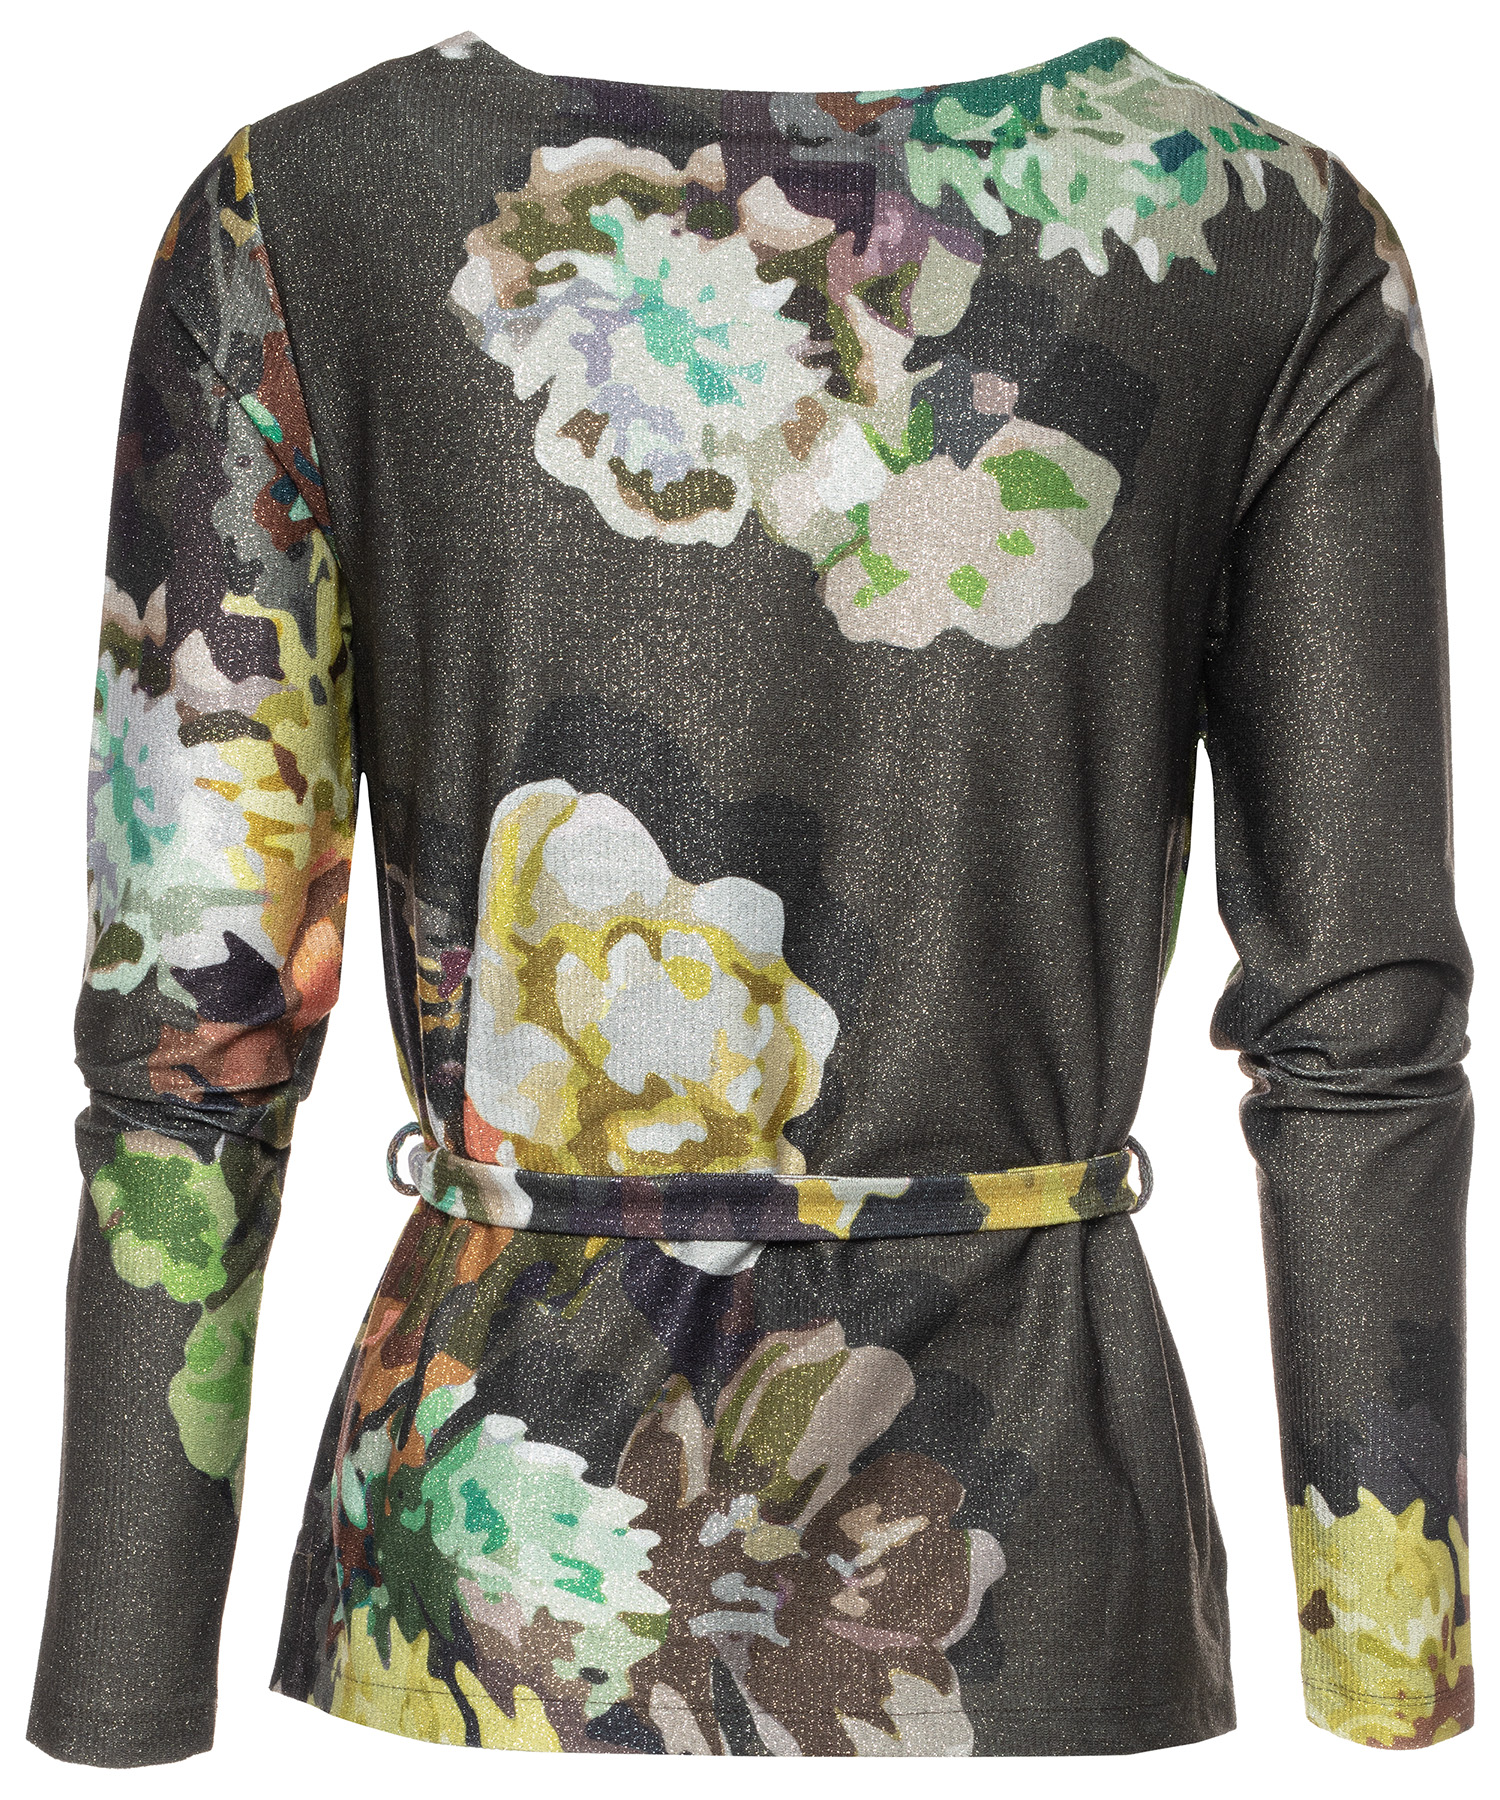 Kyra & Ko shirt Chanel